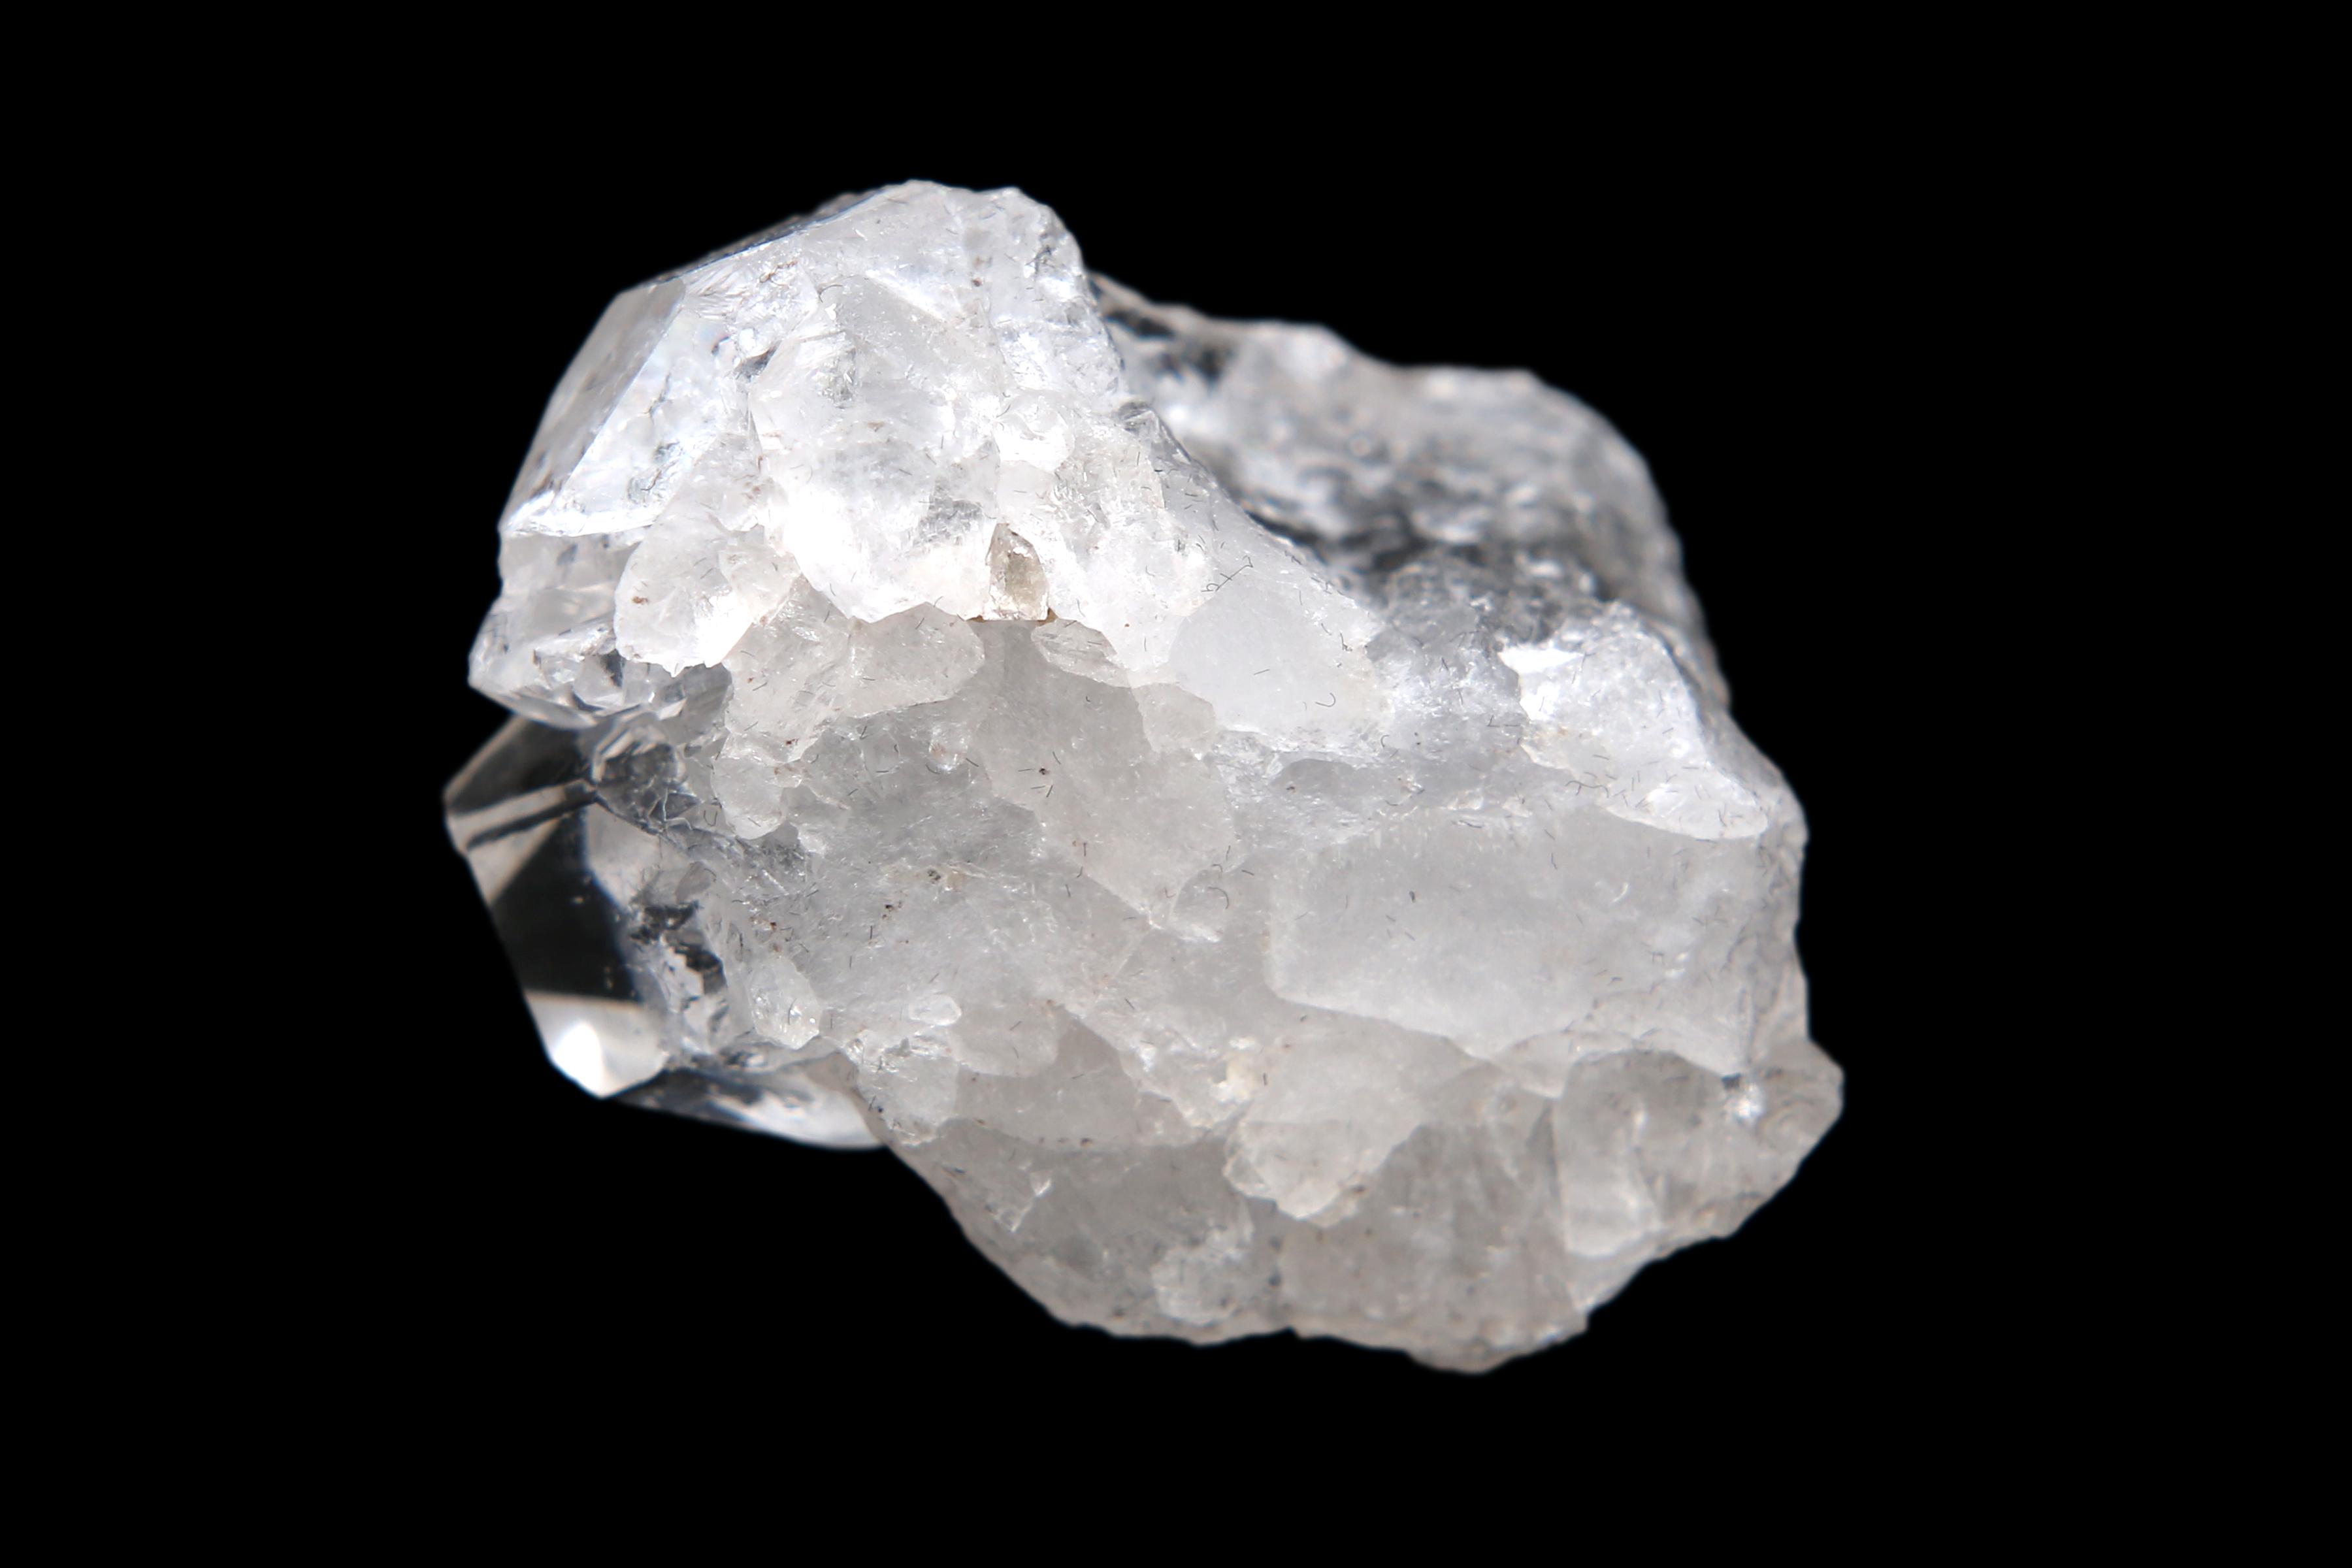 Quartz Crystal Mineral Specimen - Celestial Earth Minerals